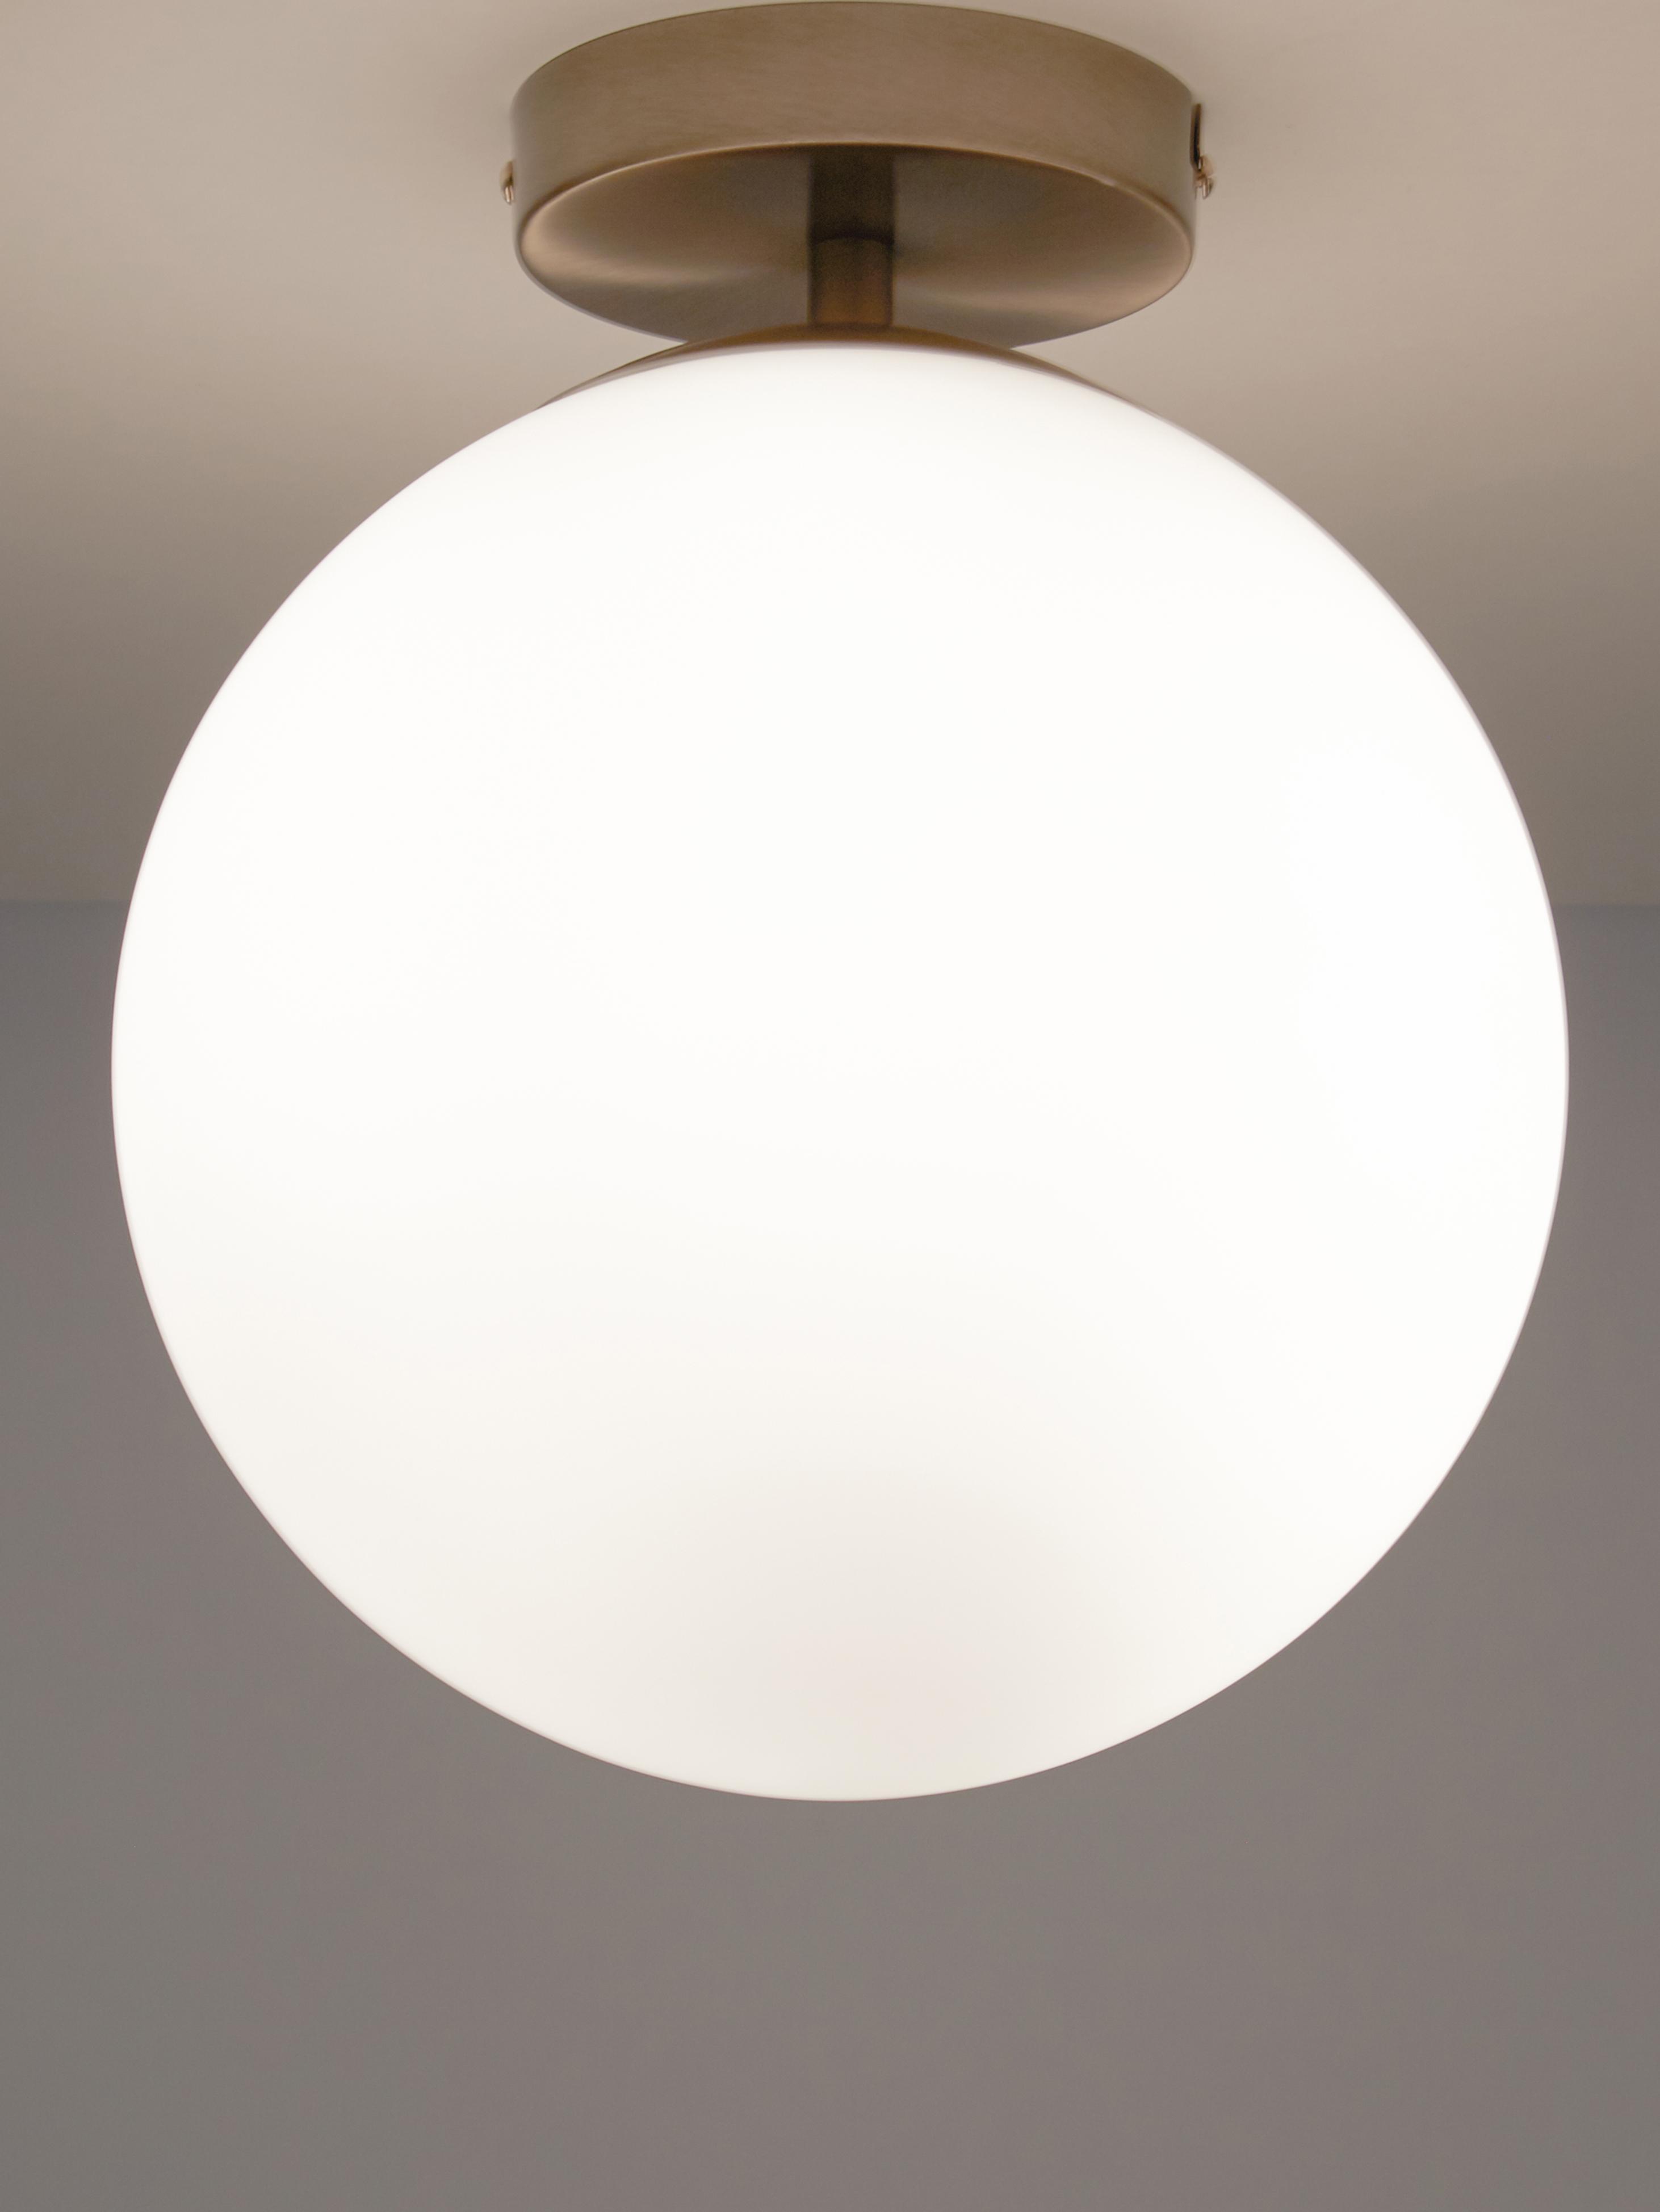 Lampada da soffitto Hitch, Paralume: vetro, Baldacchino e rilegatura: ottone opaco Paralume: bianco, Ø 25 x Alt. 30 cm